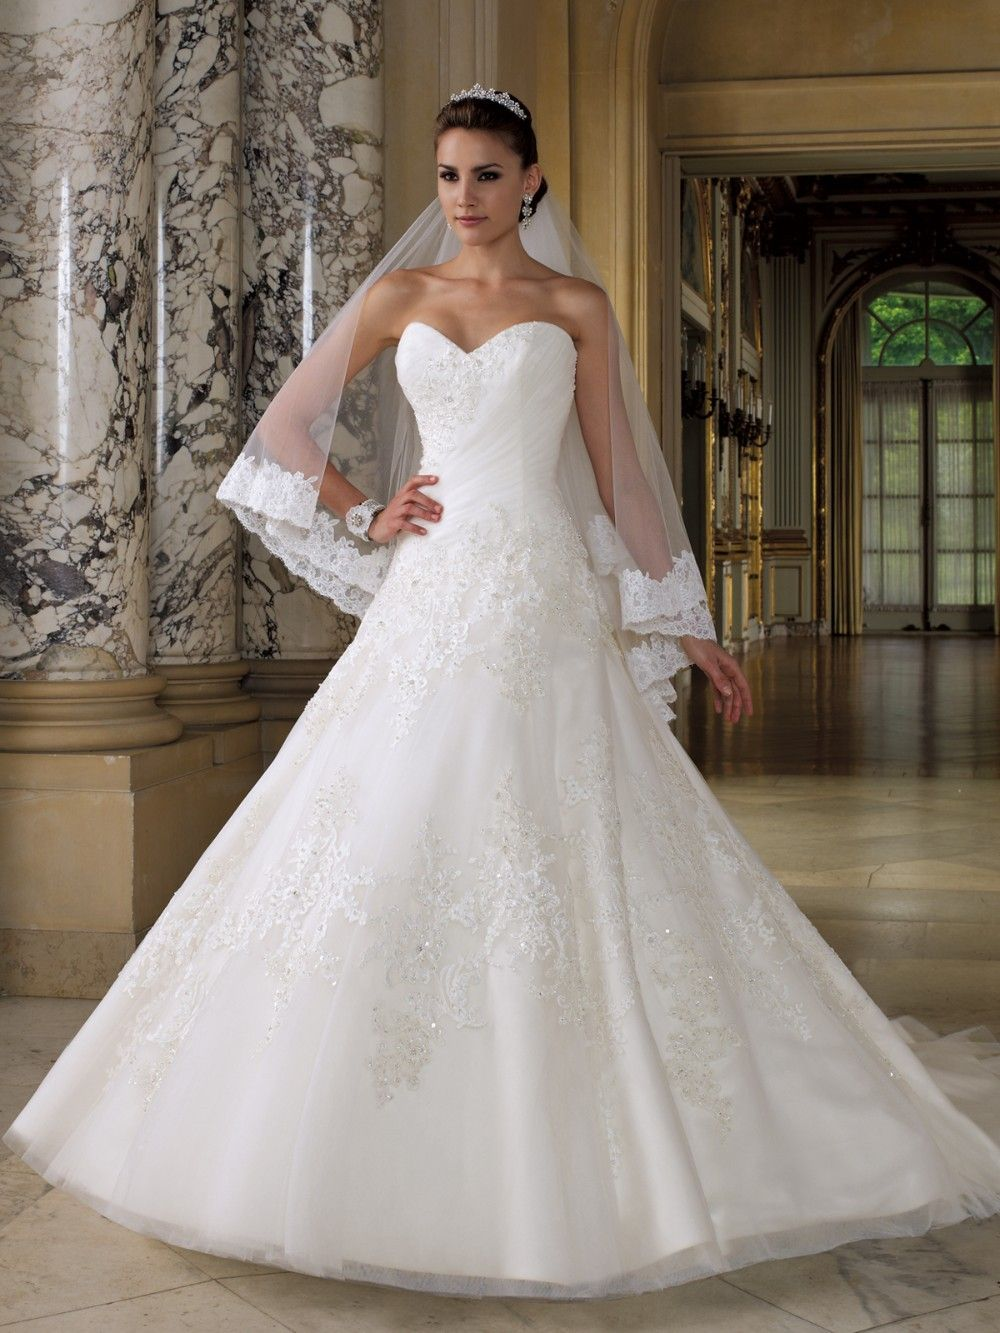 Vestidos de noche España: Moda de vestido de novia | Vestidos ...